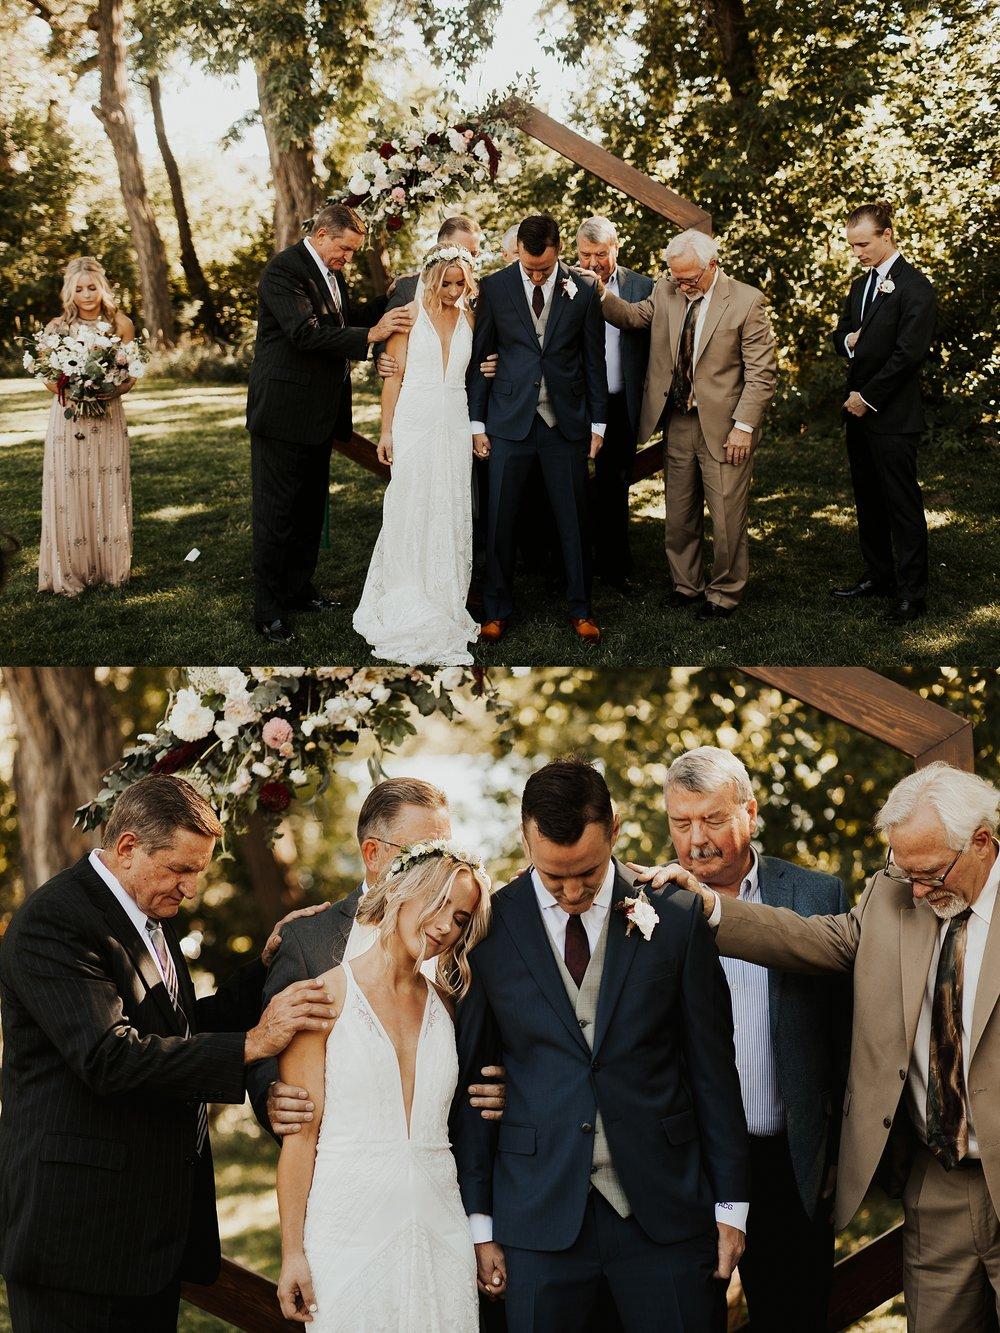 Lyons_Farmette_Wedding_Denver_Colorado_wedding043.JPG